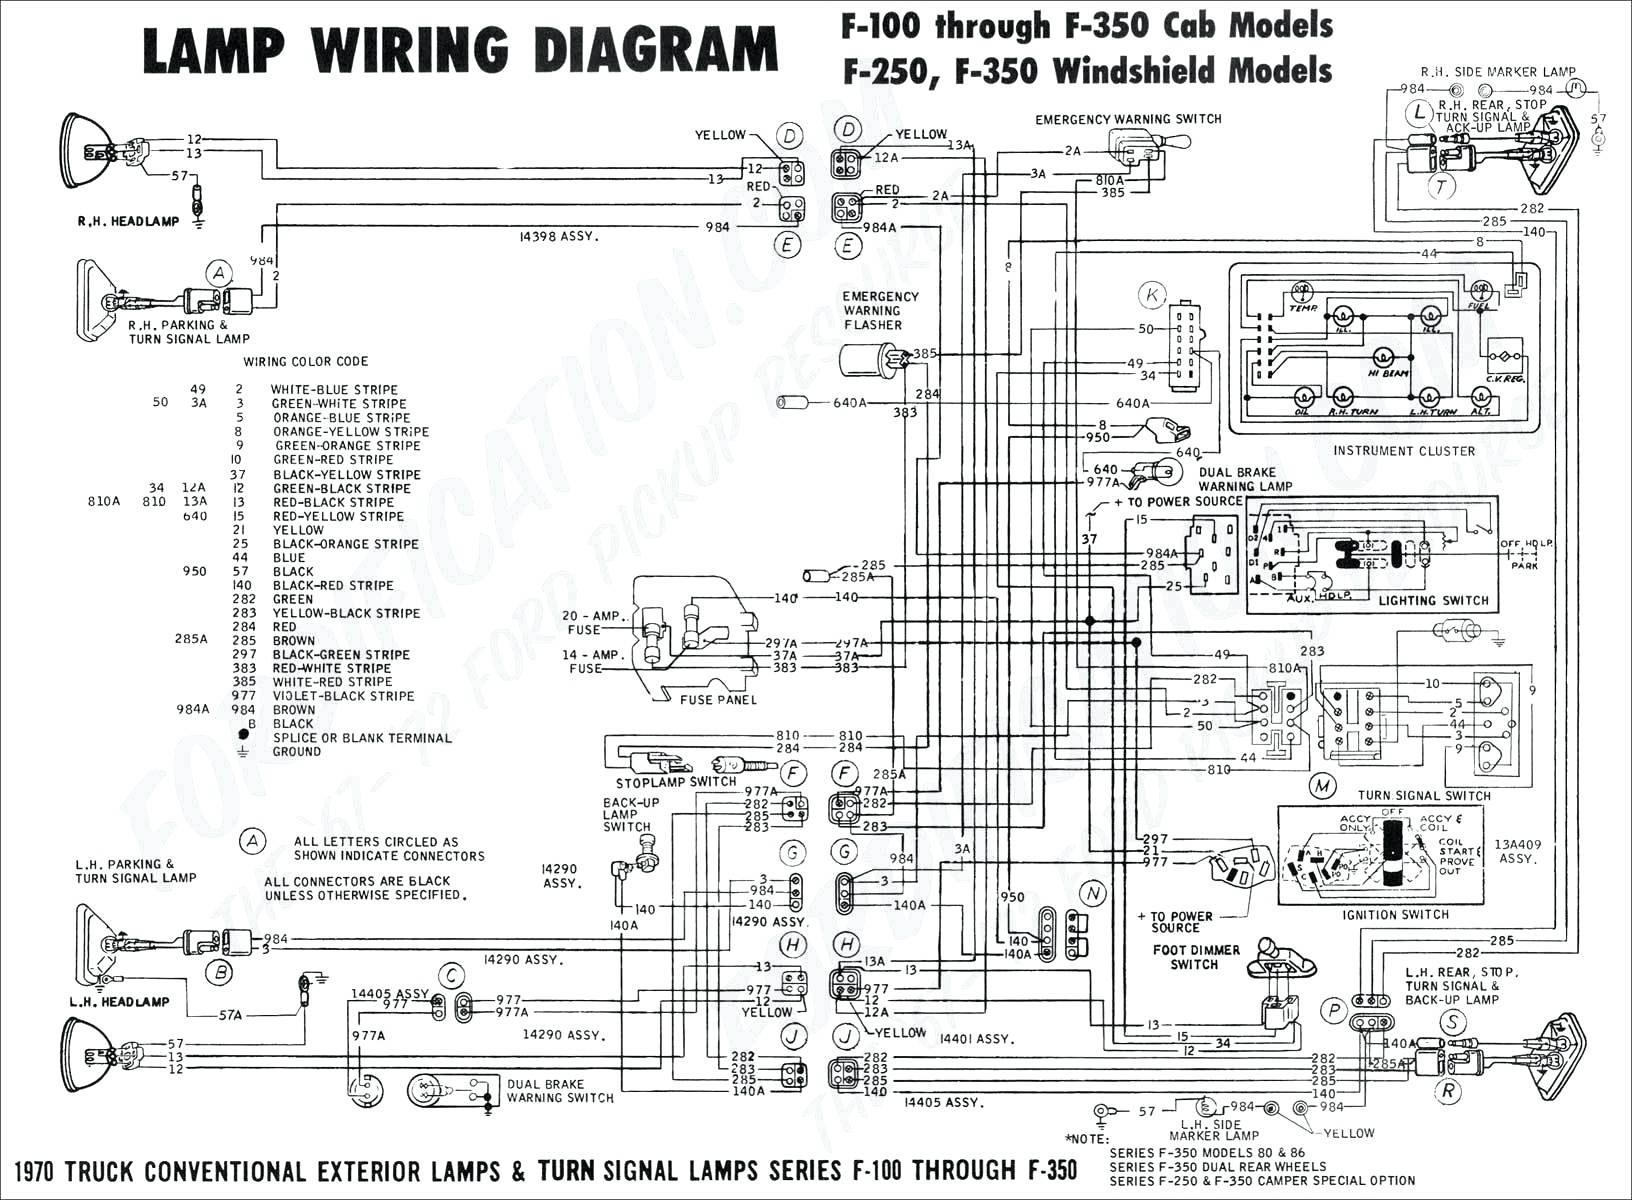 John Deere Gx345 Electrical Diagrams ✦diagram Based✦ 1998 Dodge Ram 2500 Wiring Diagram